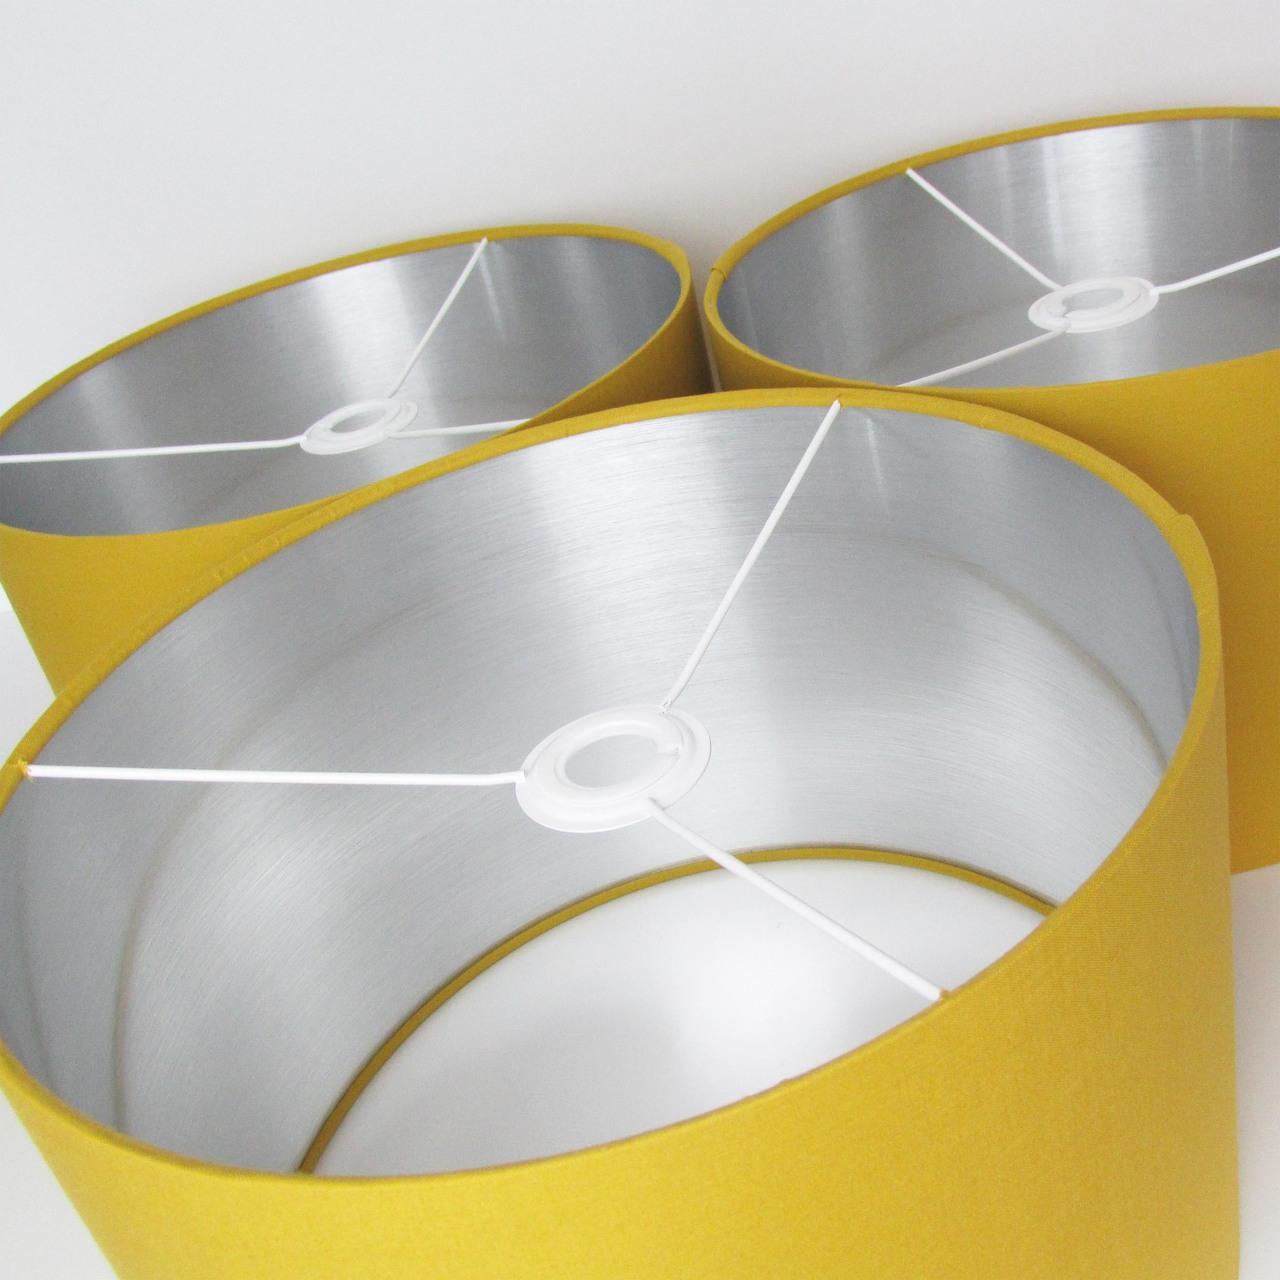 mustard and silver lining lampshades - group shot